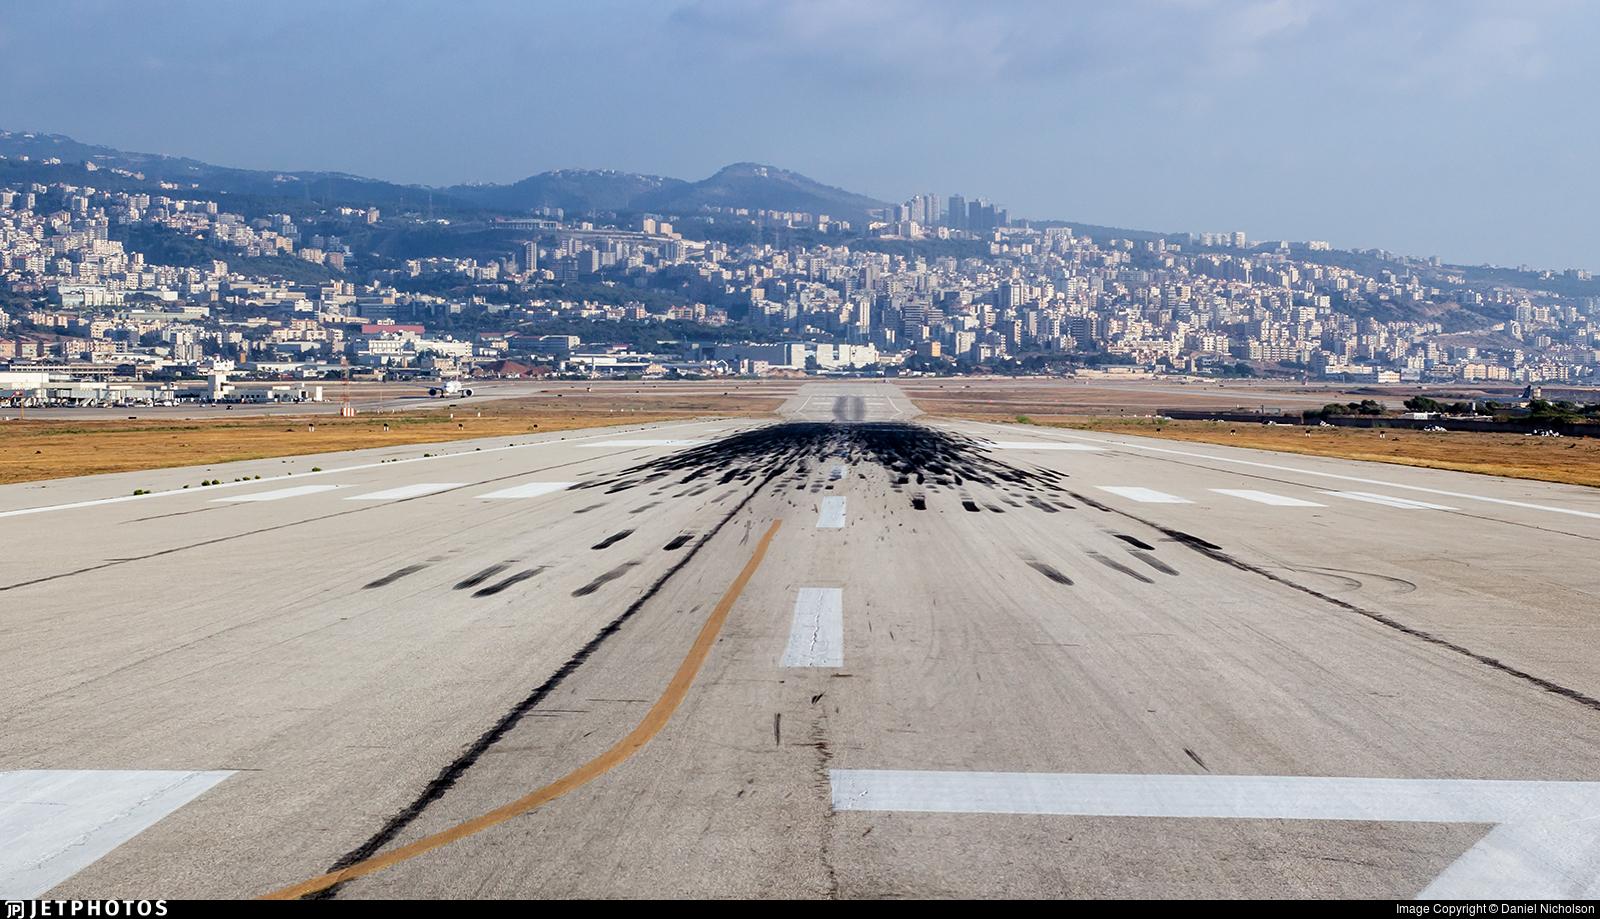 OLBA - Airport - Runway